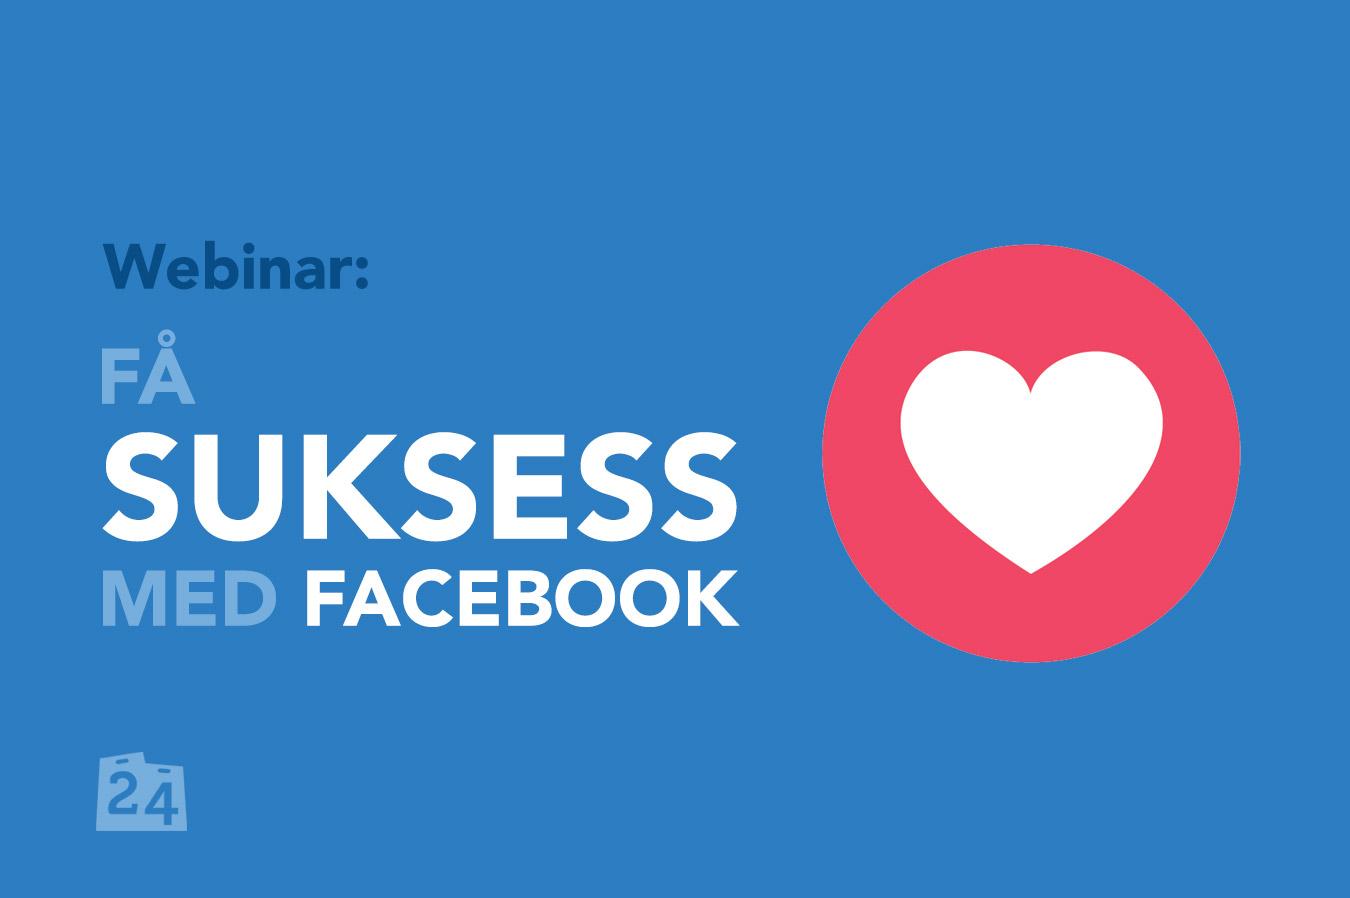 Få-suksess-med-Facebook,-webinar-2